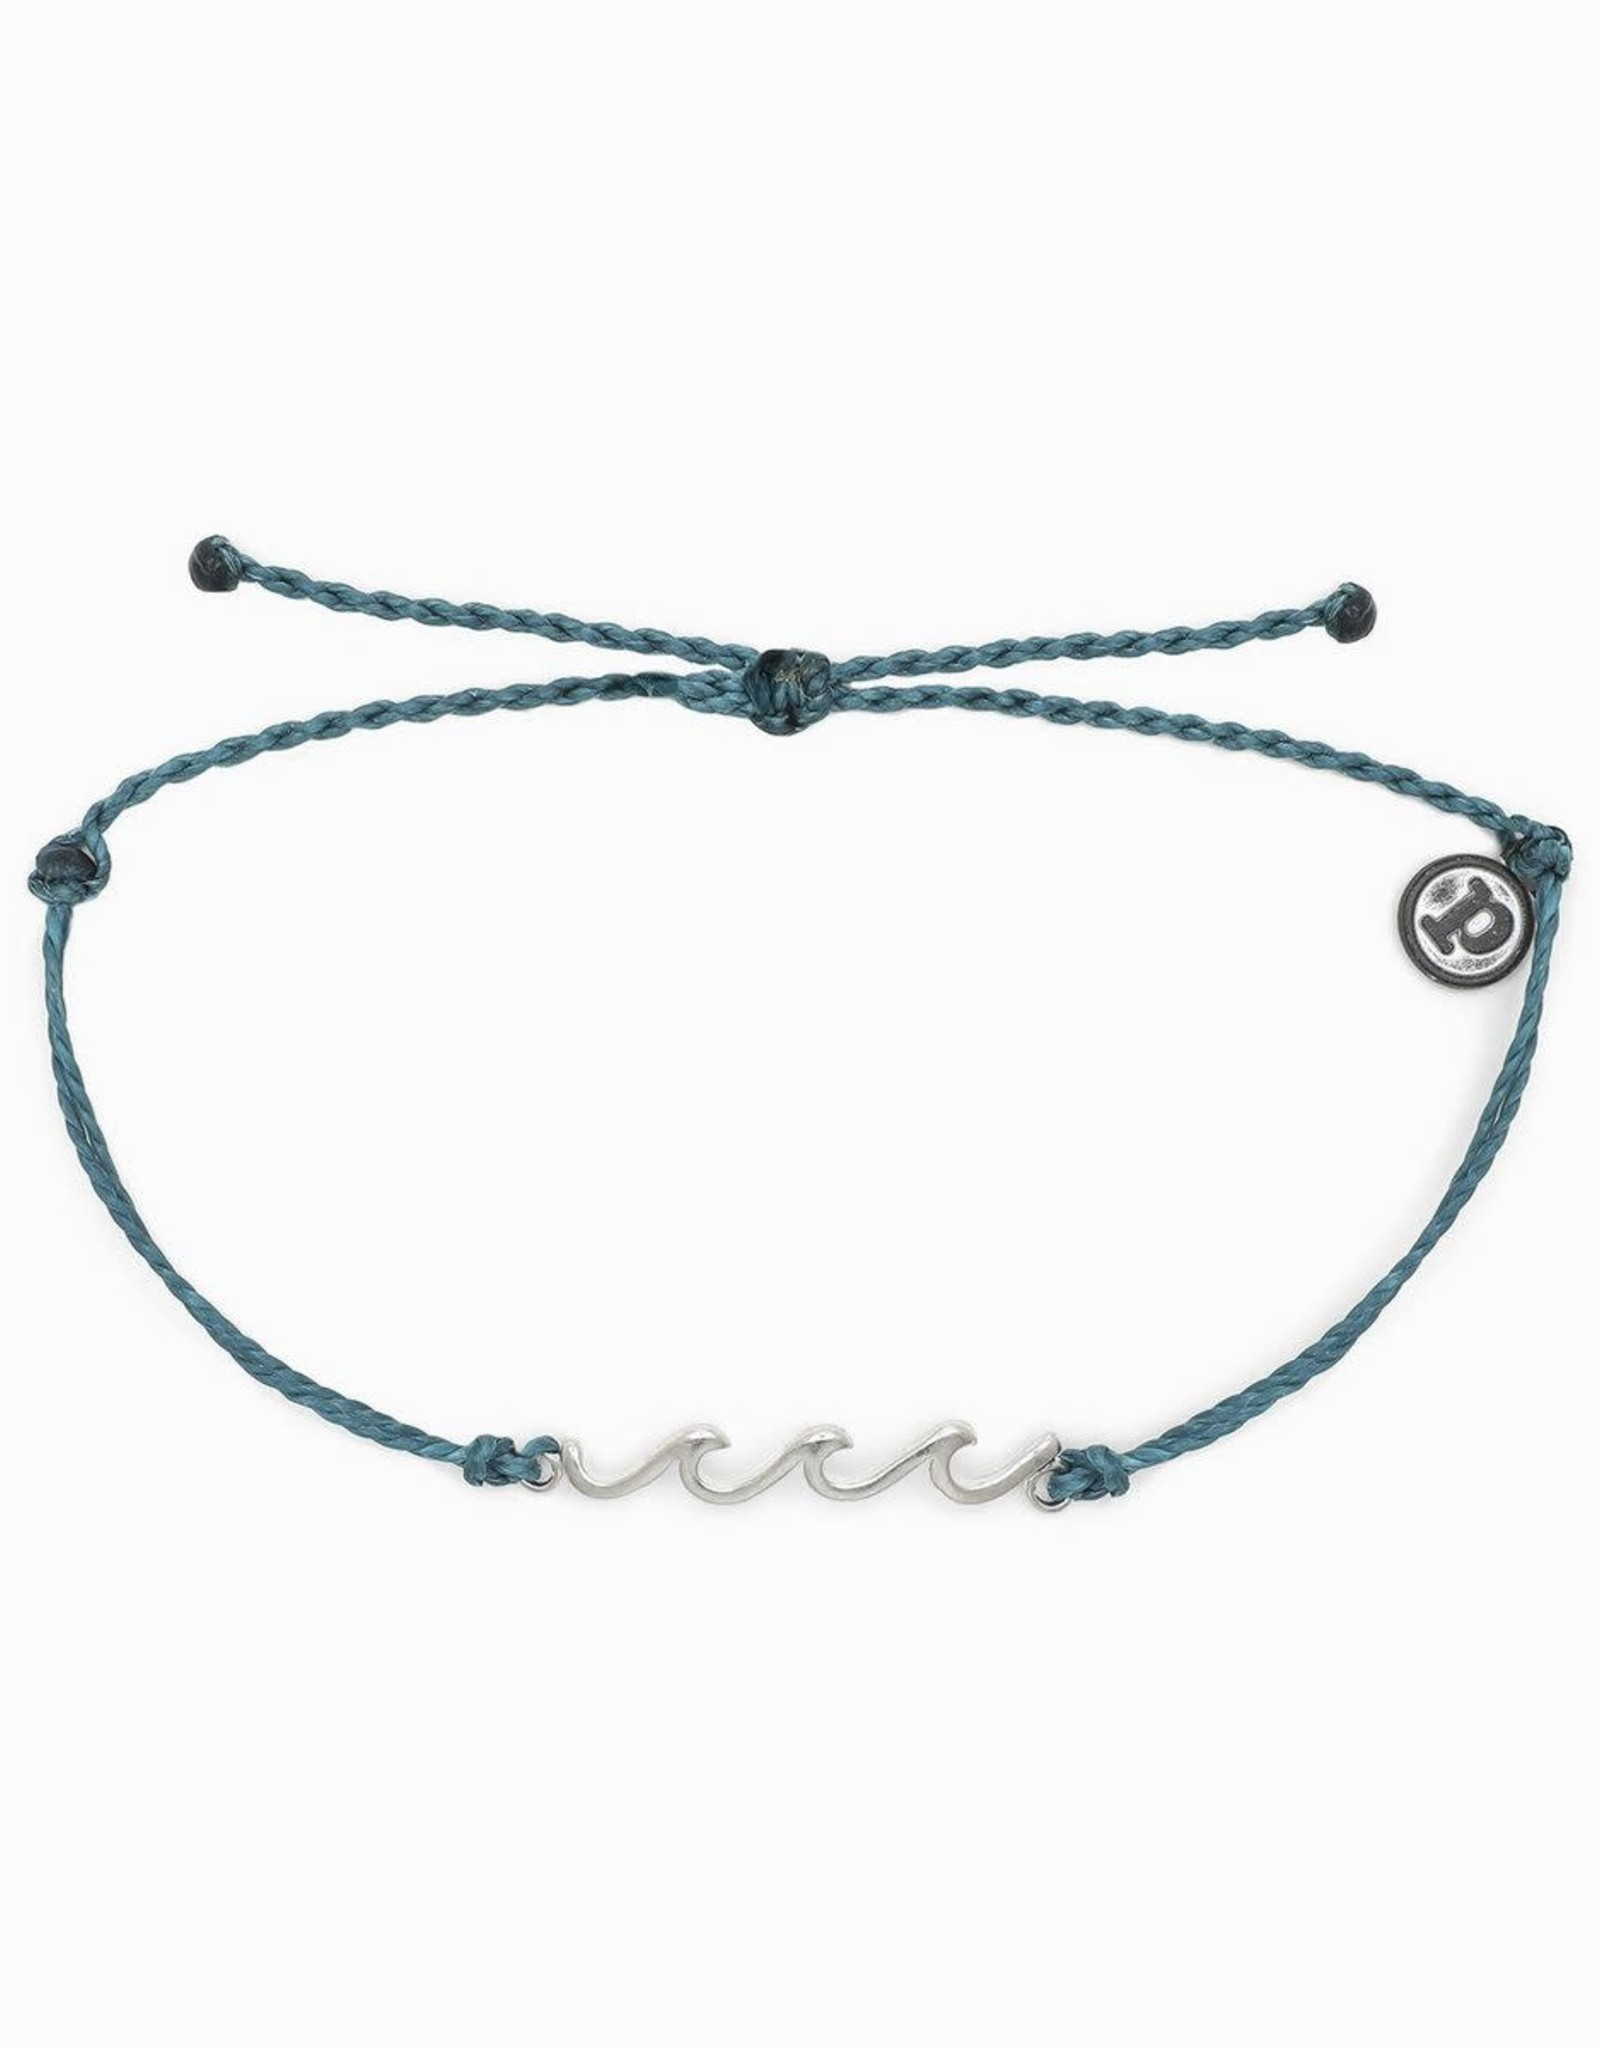 DELICATE WAVE Bracelet,  LIGHT BLUE GREEN